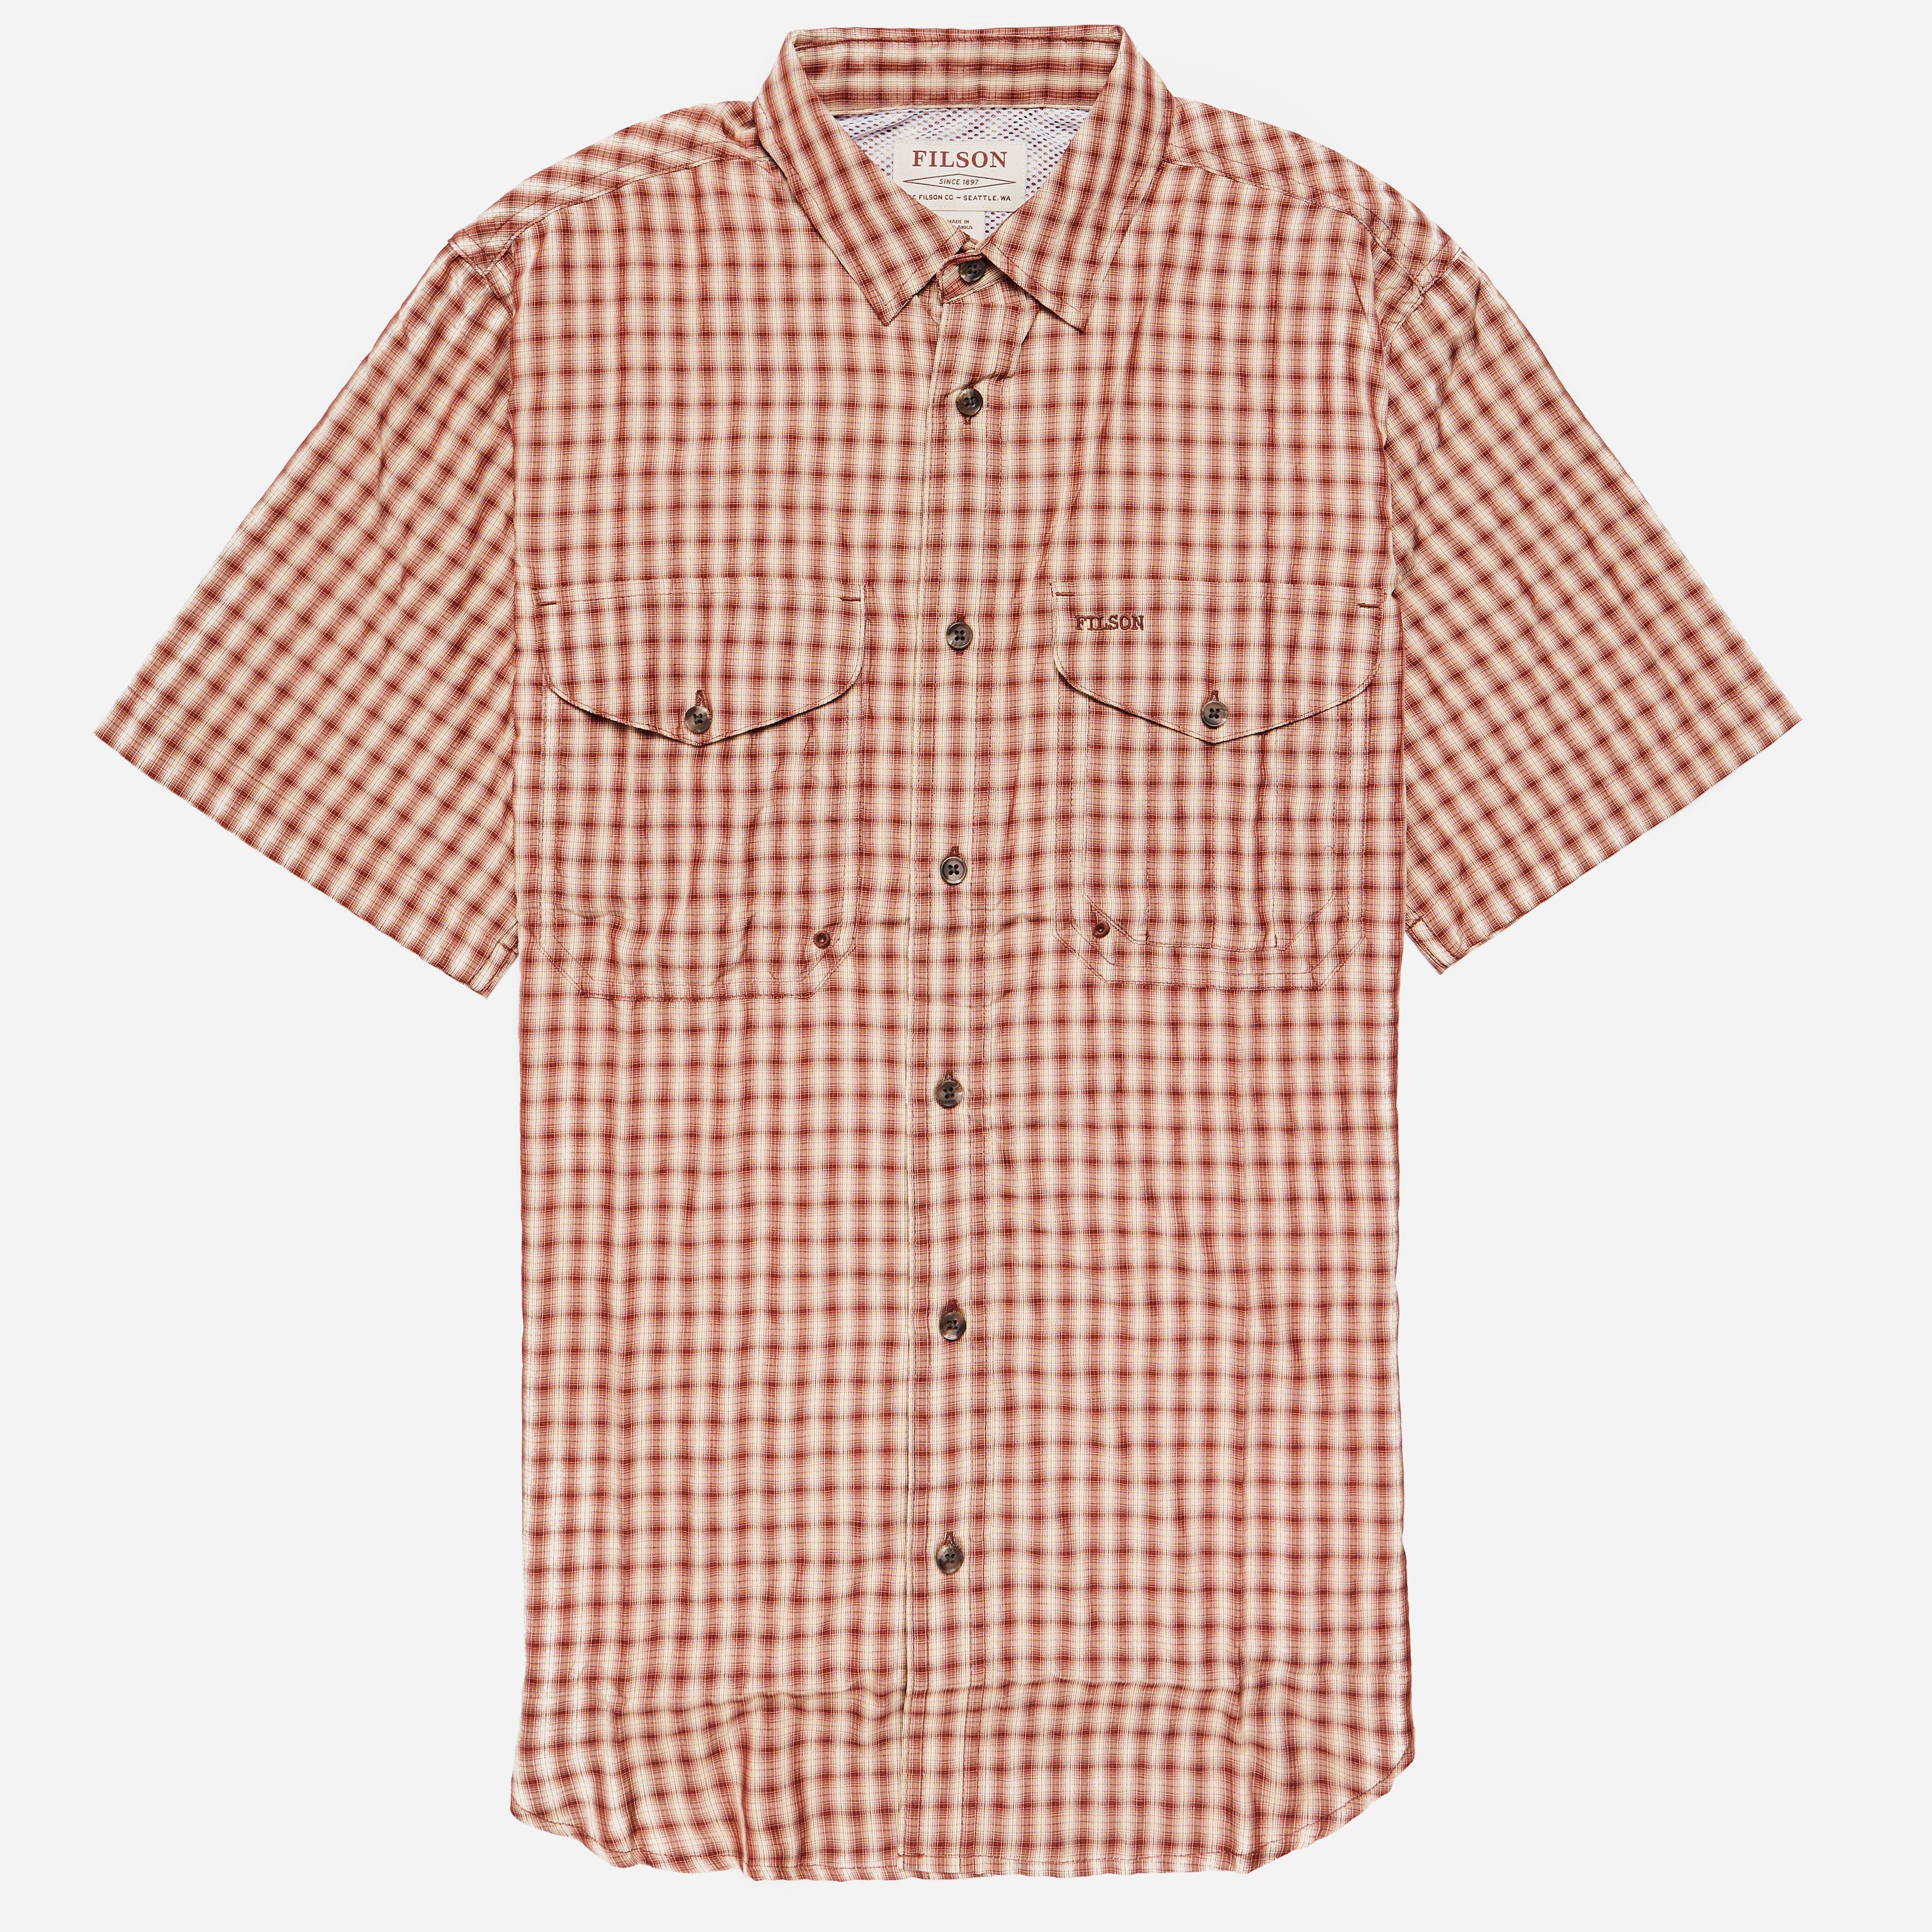 Filson Twin Lakes S/S Shirt